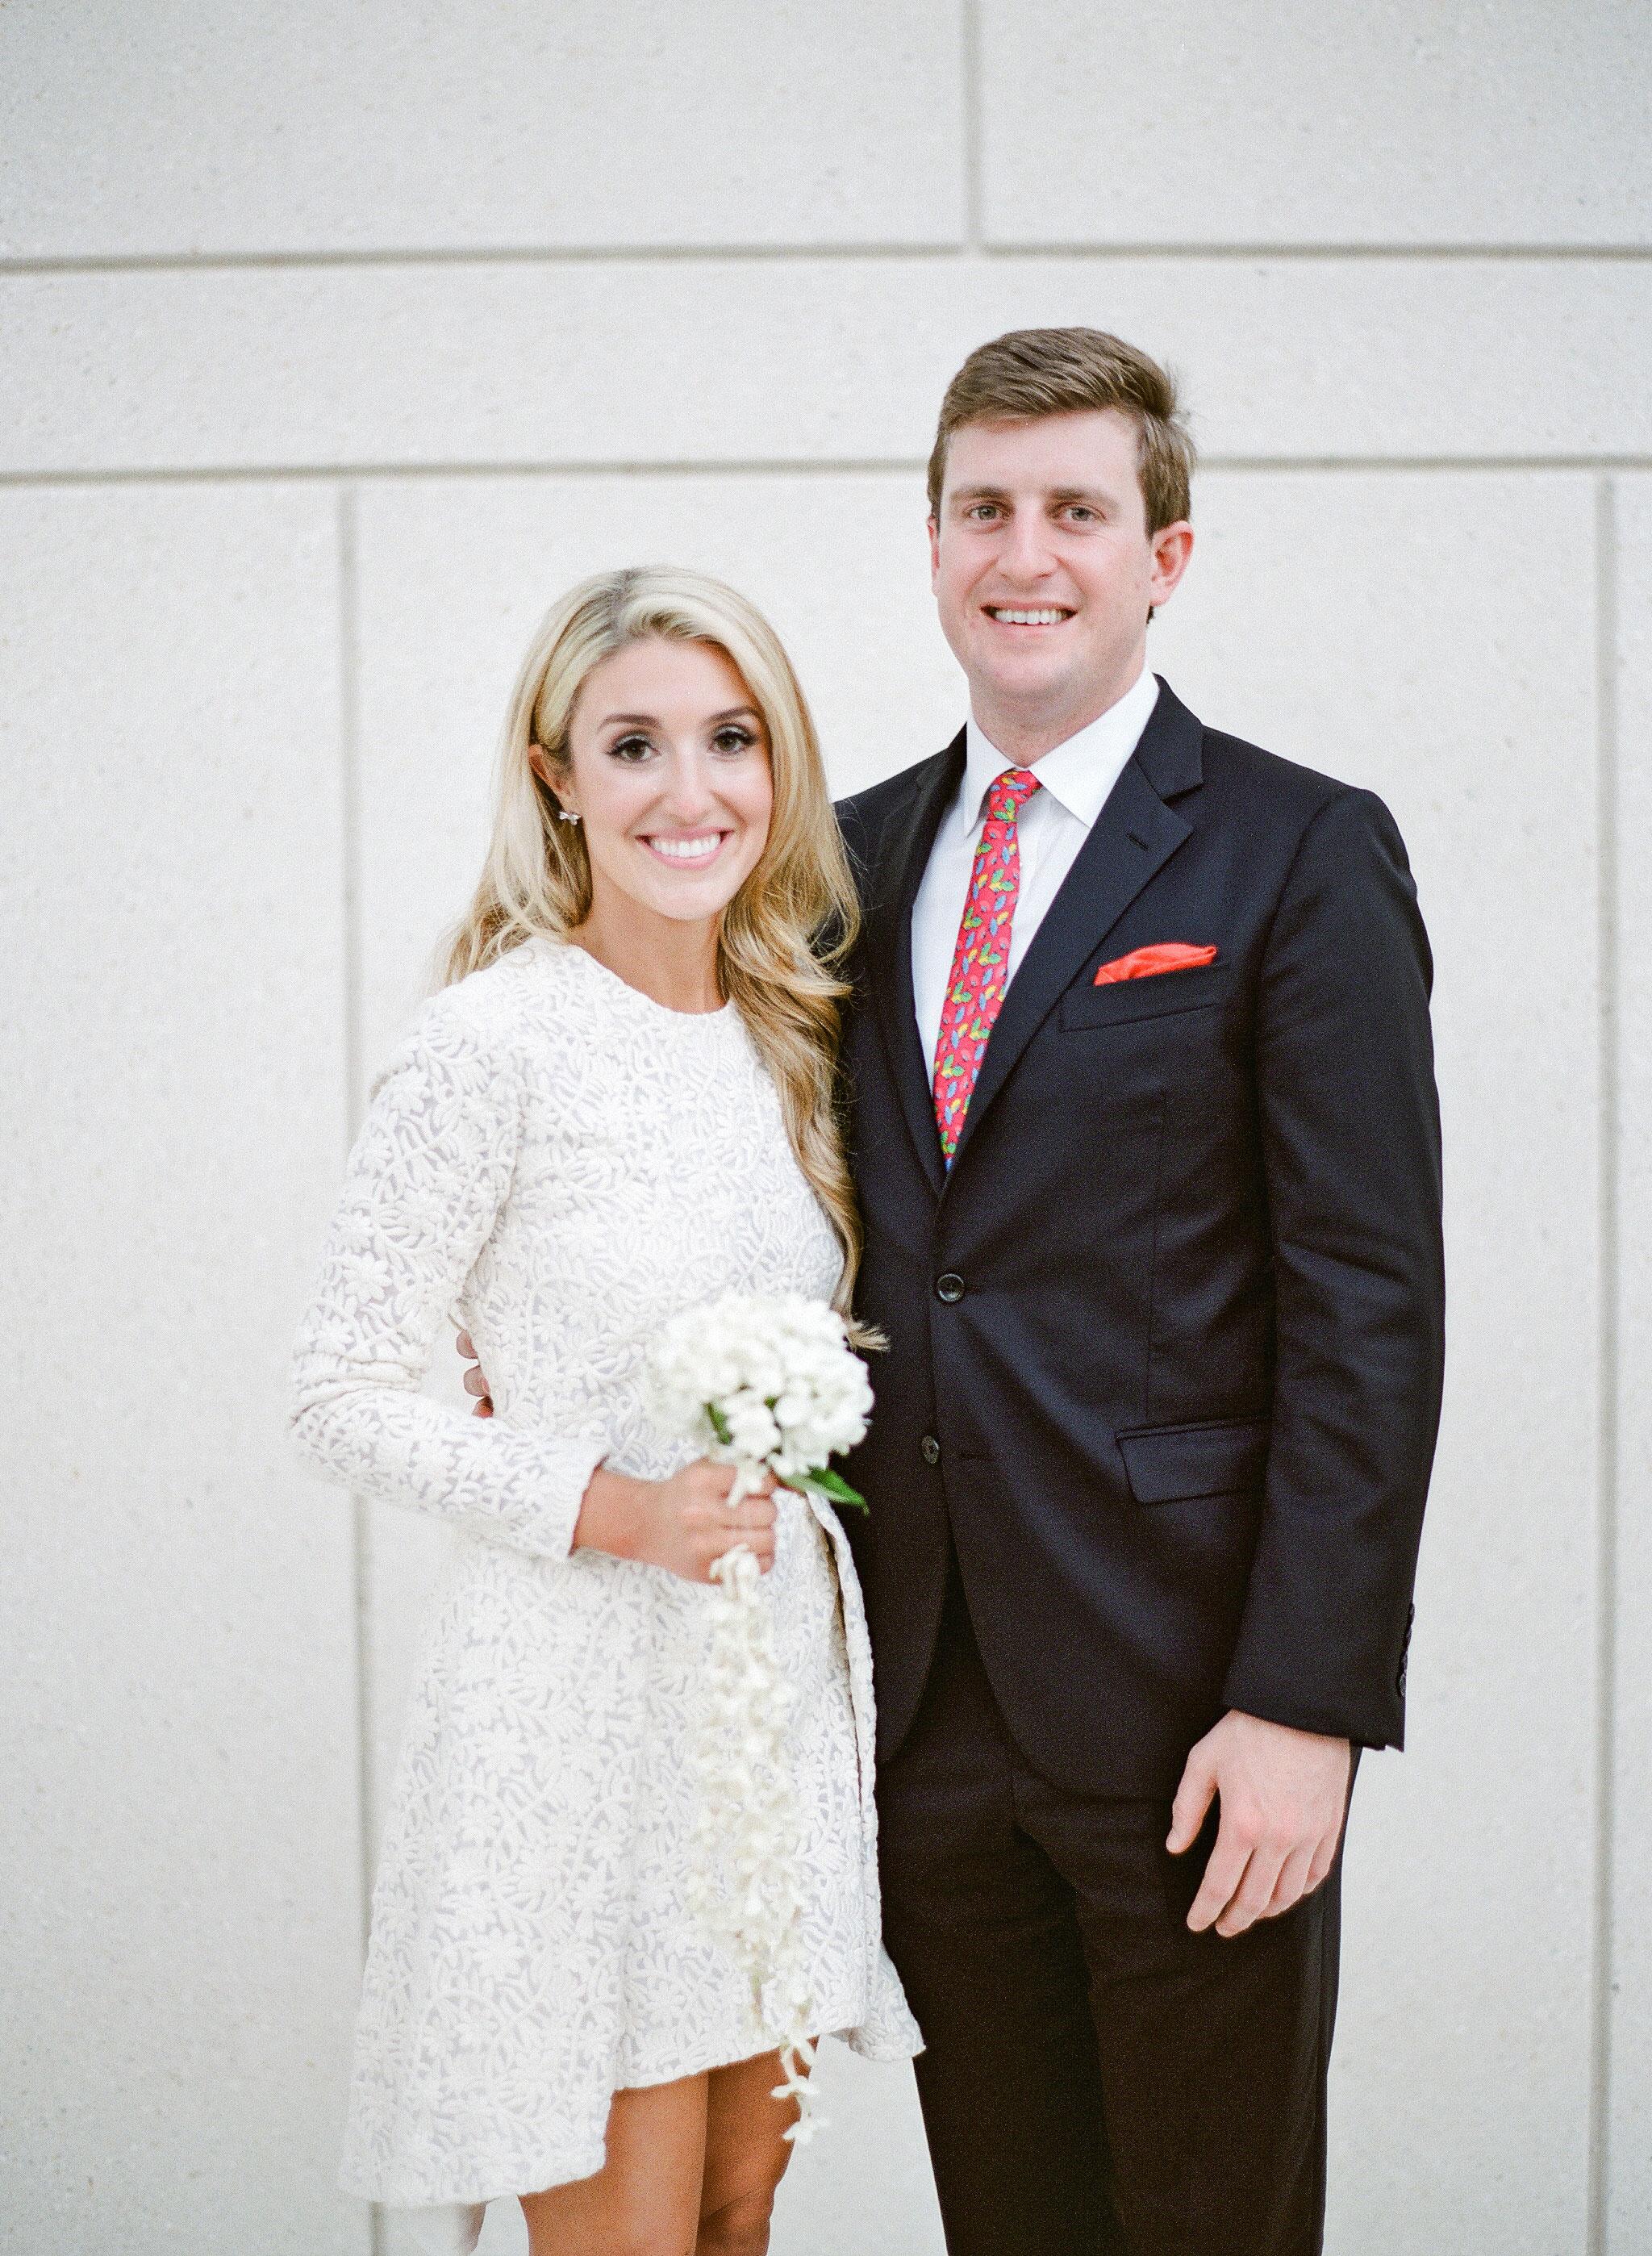 natalie jamey wedding church ceremony